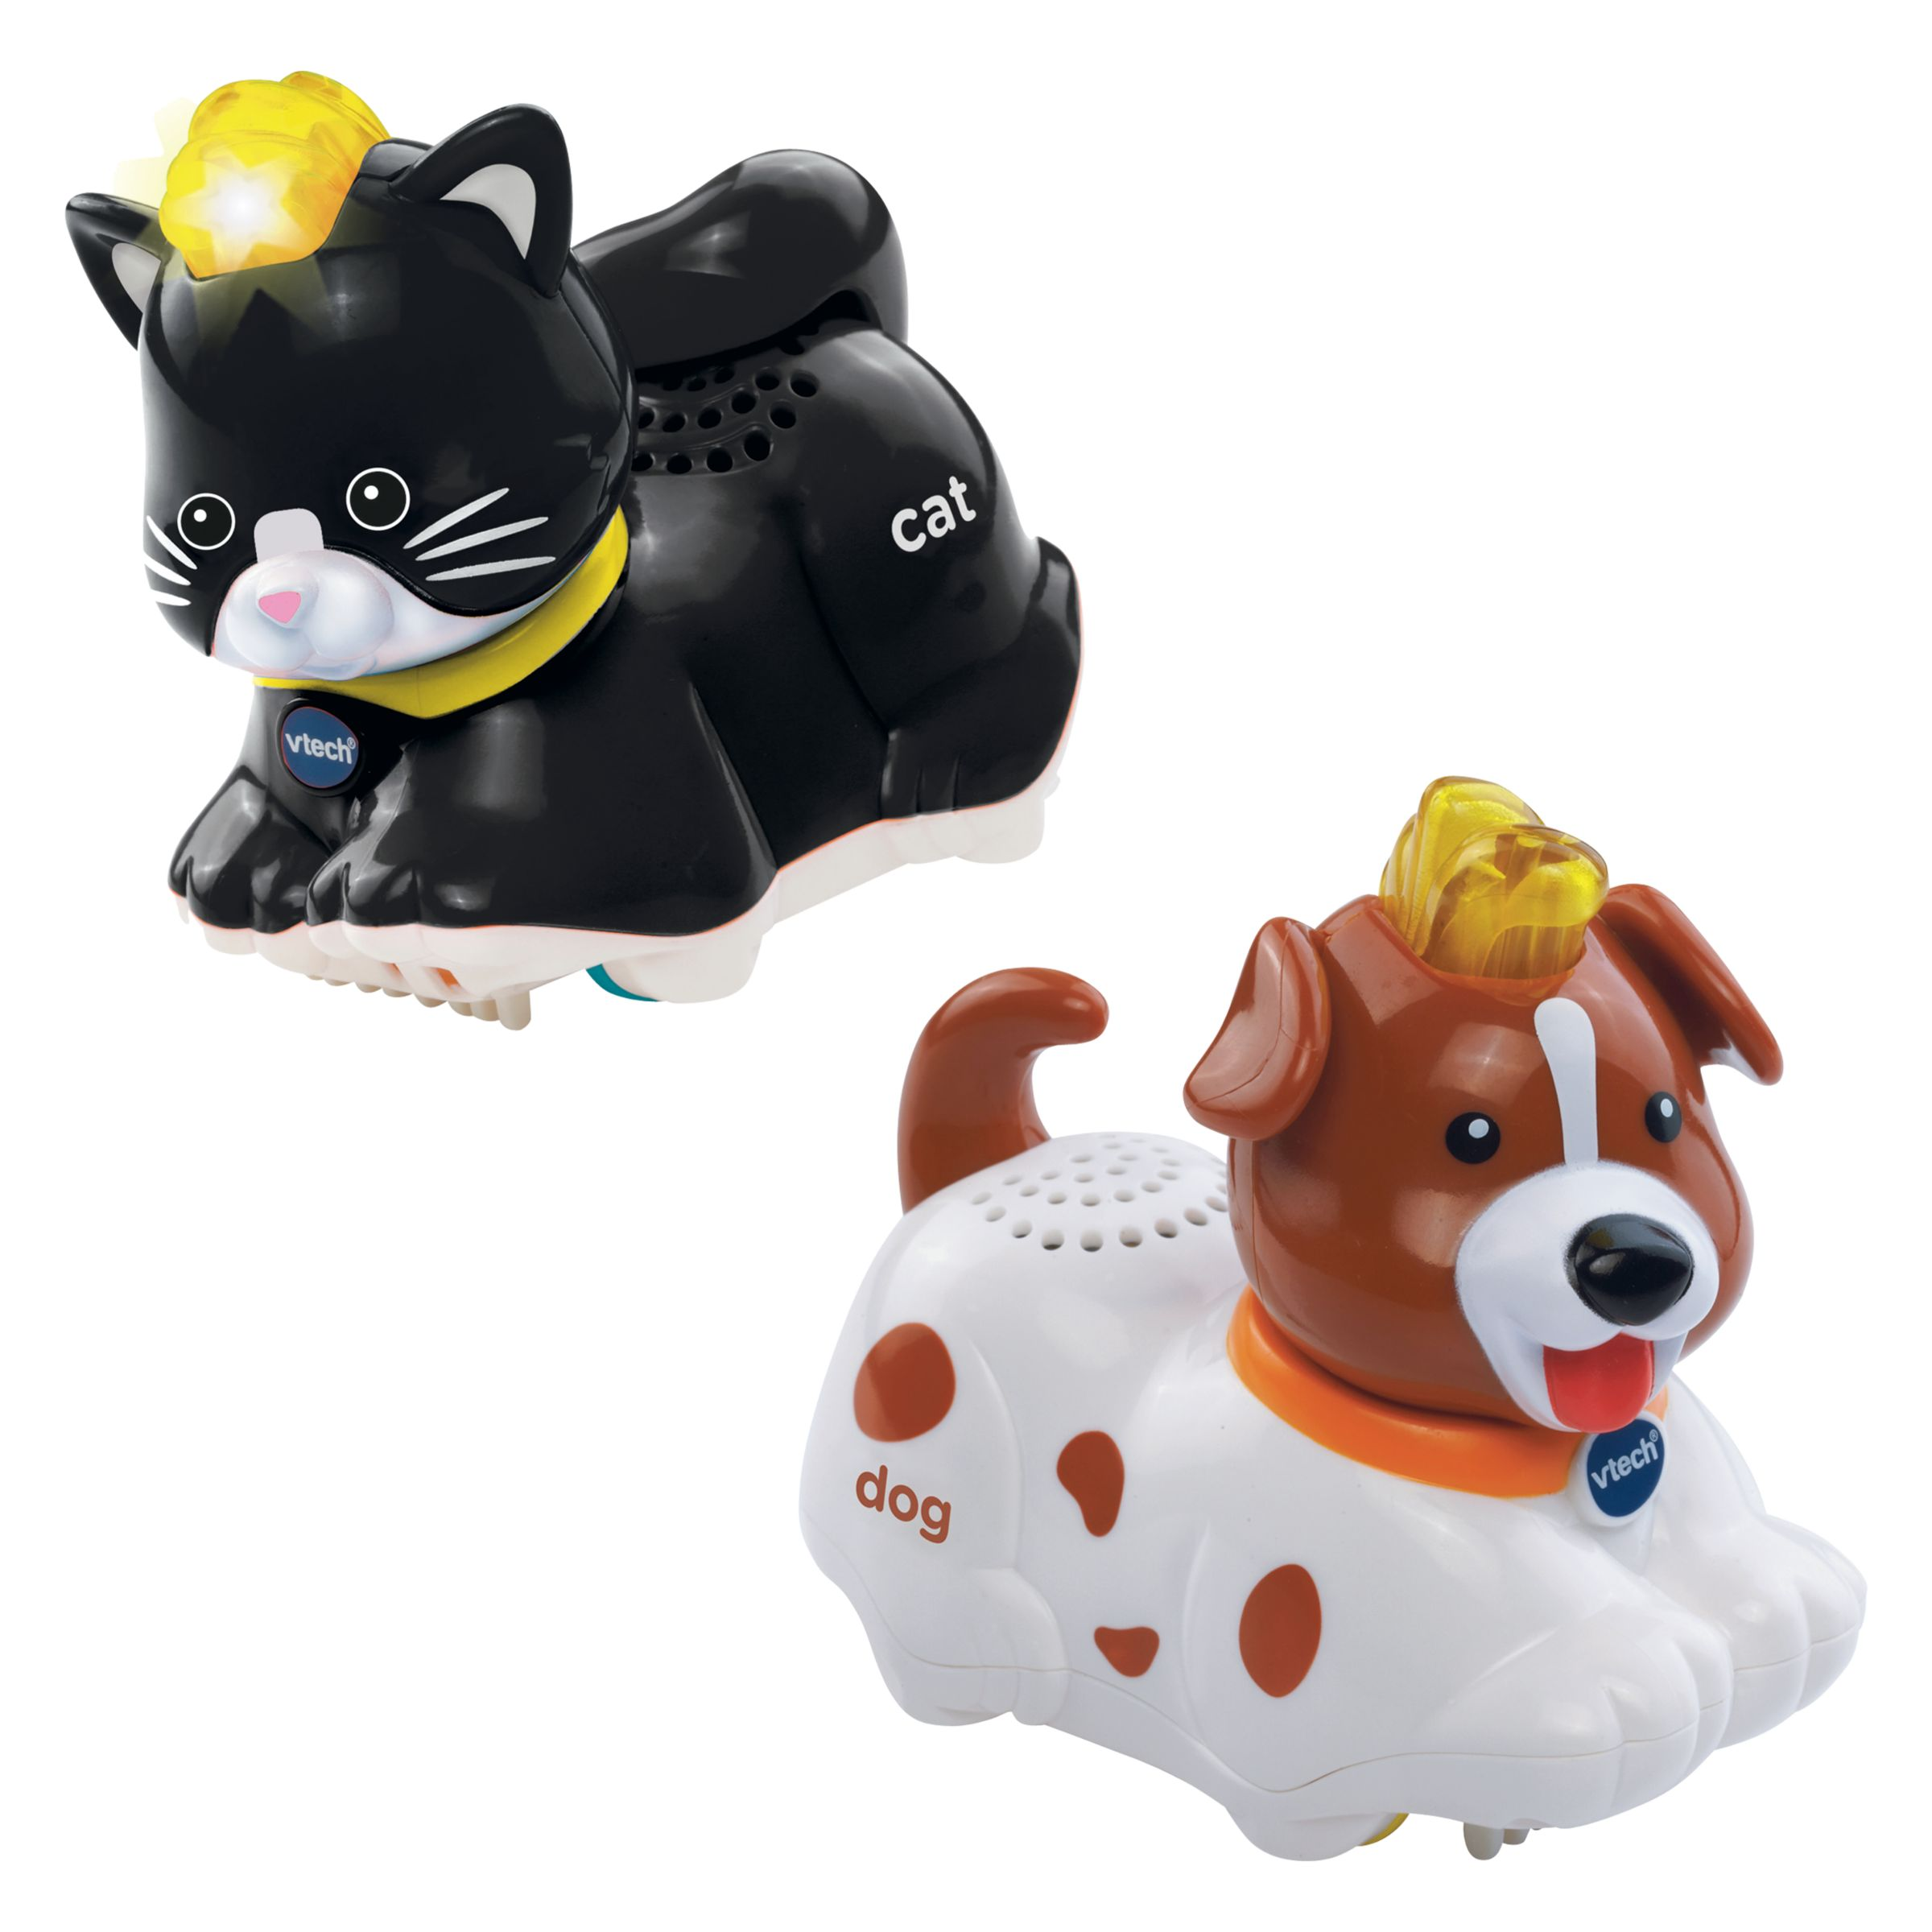 Vtech VTech Baby Toot-Toot Animals Cat & Dog Duo